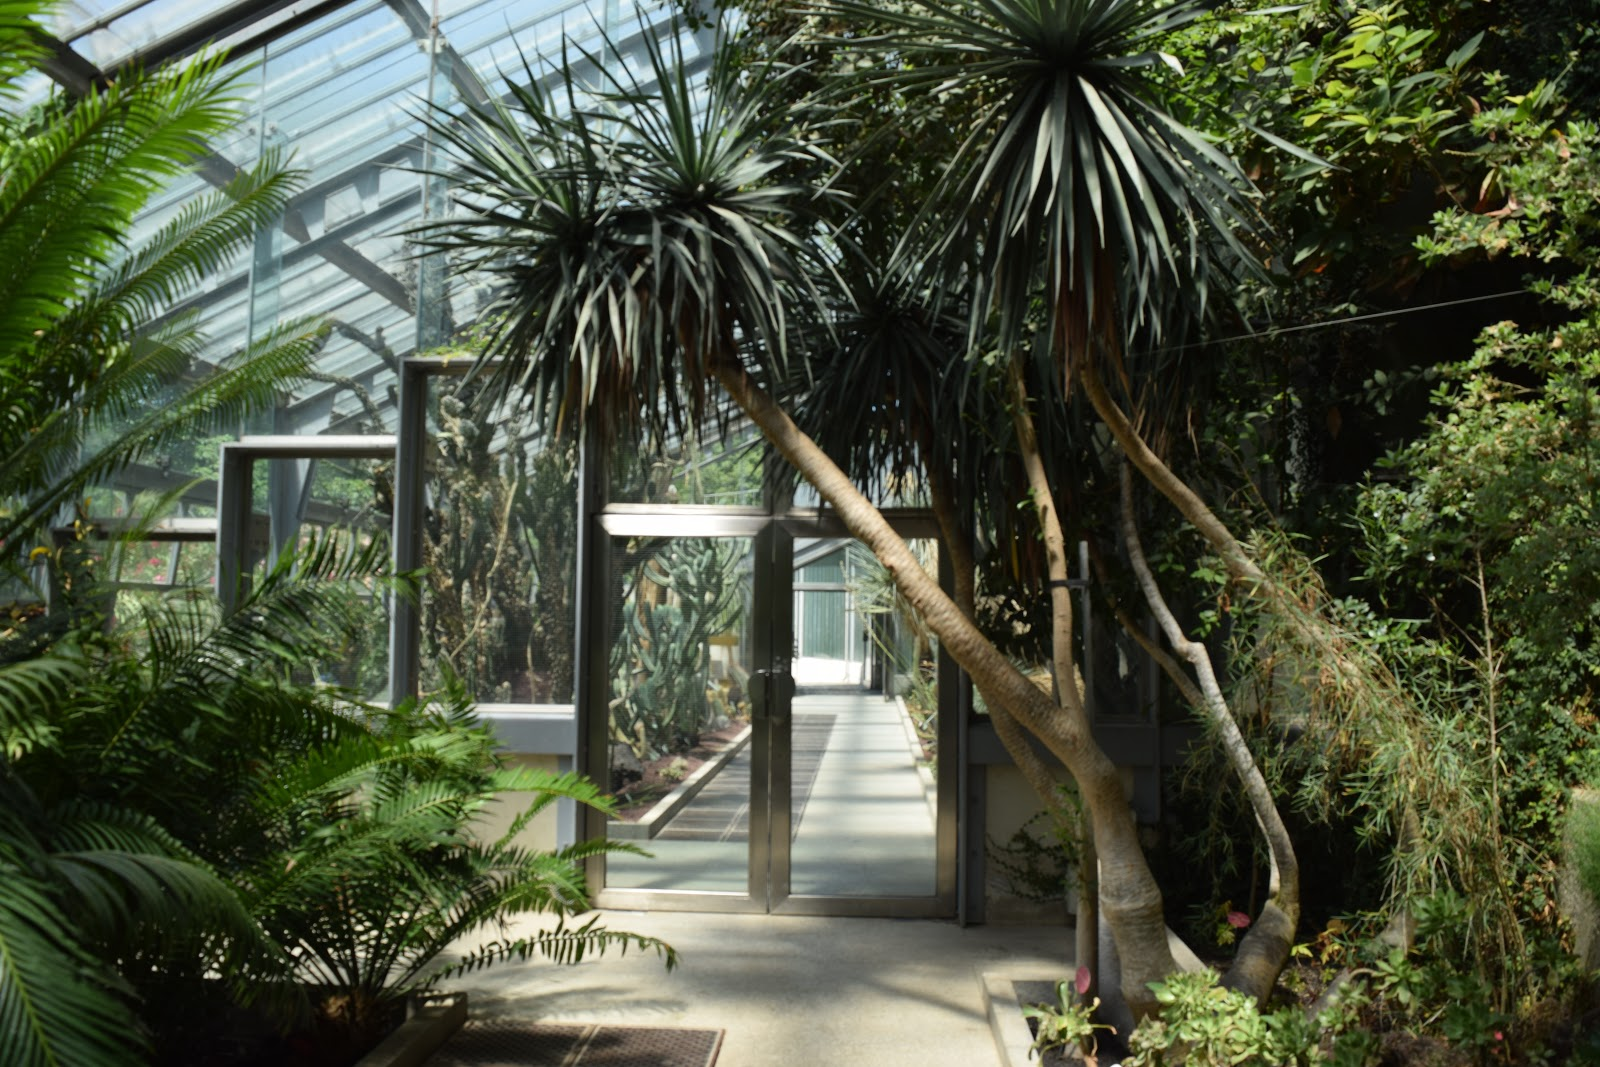 Madrid Botanic Gardens